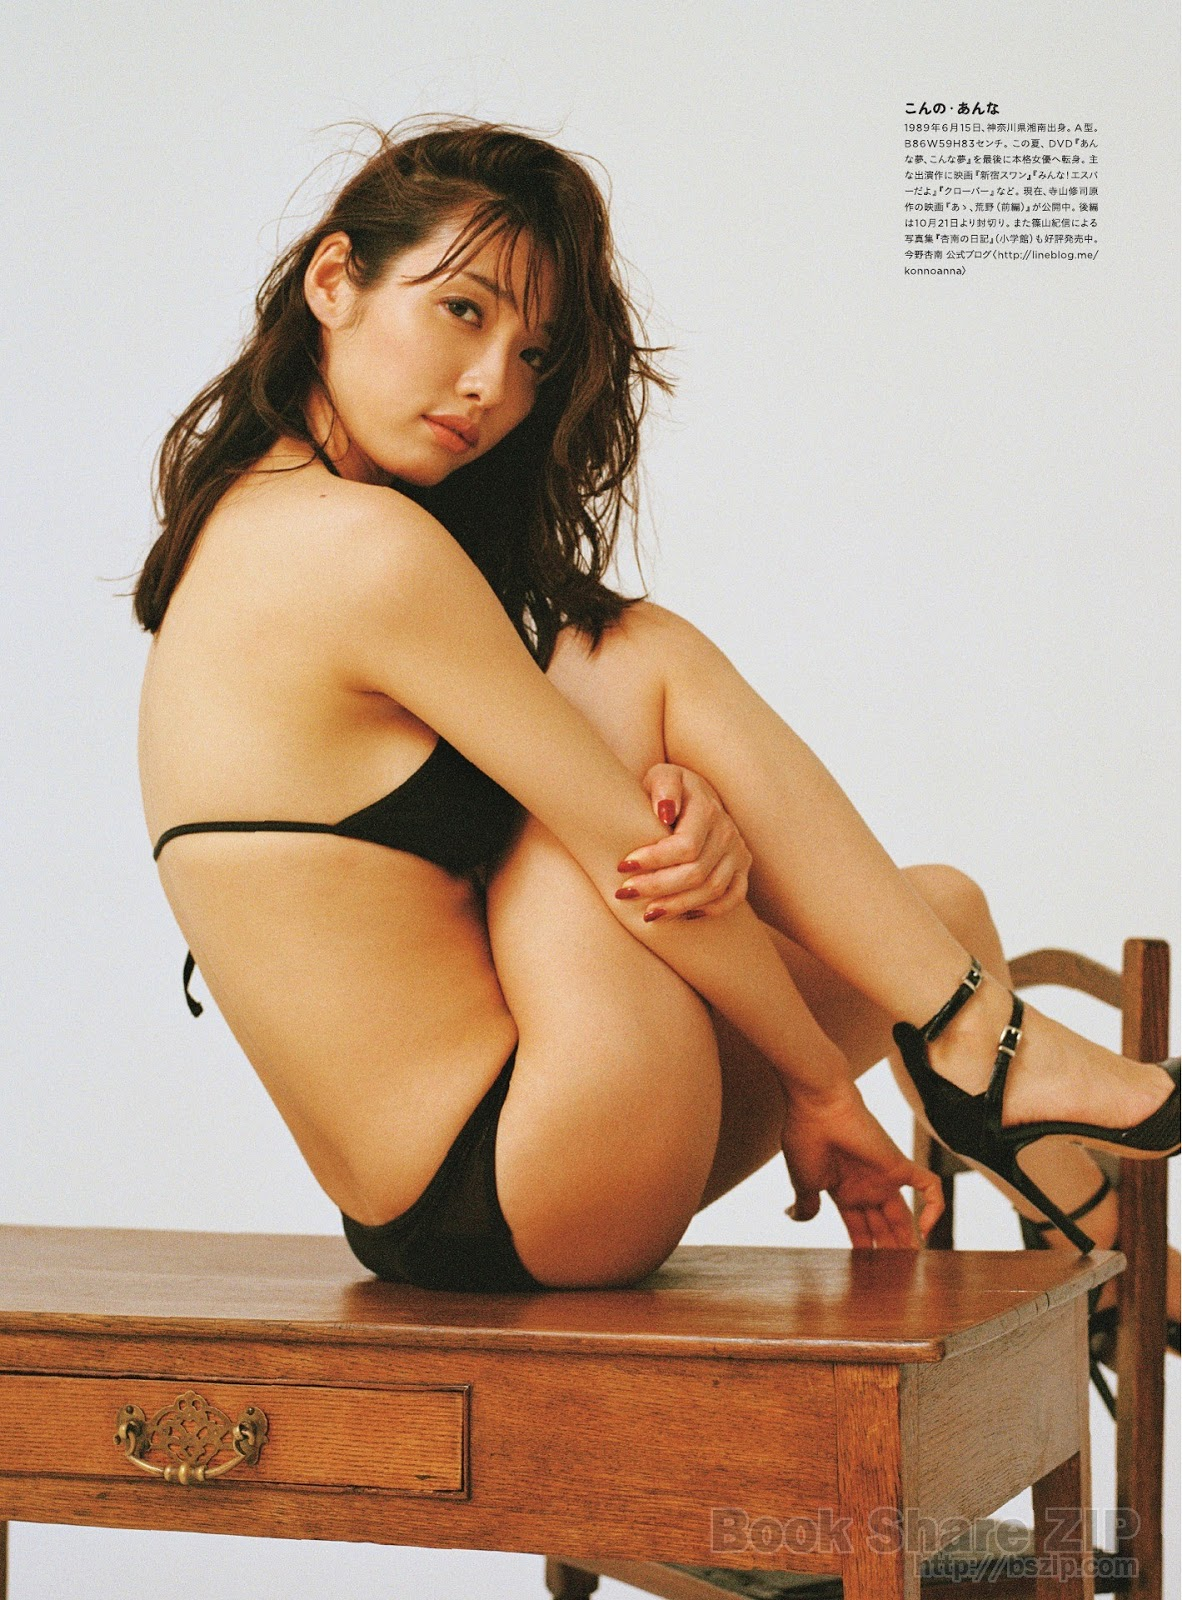 Anna Konno 今野杏奈, Cyzo 2017.11 (サイゾー 2017年11月号)